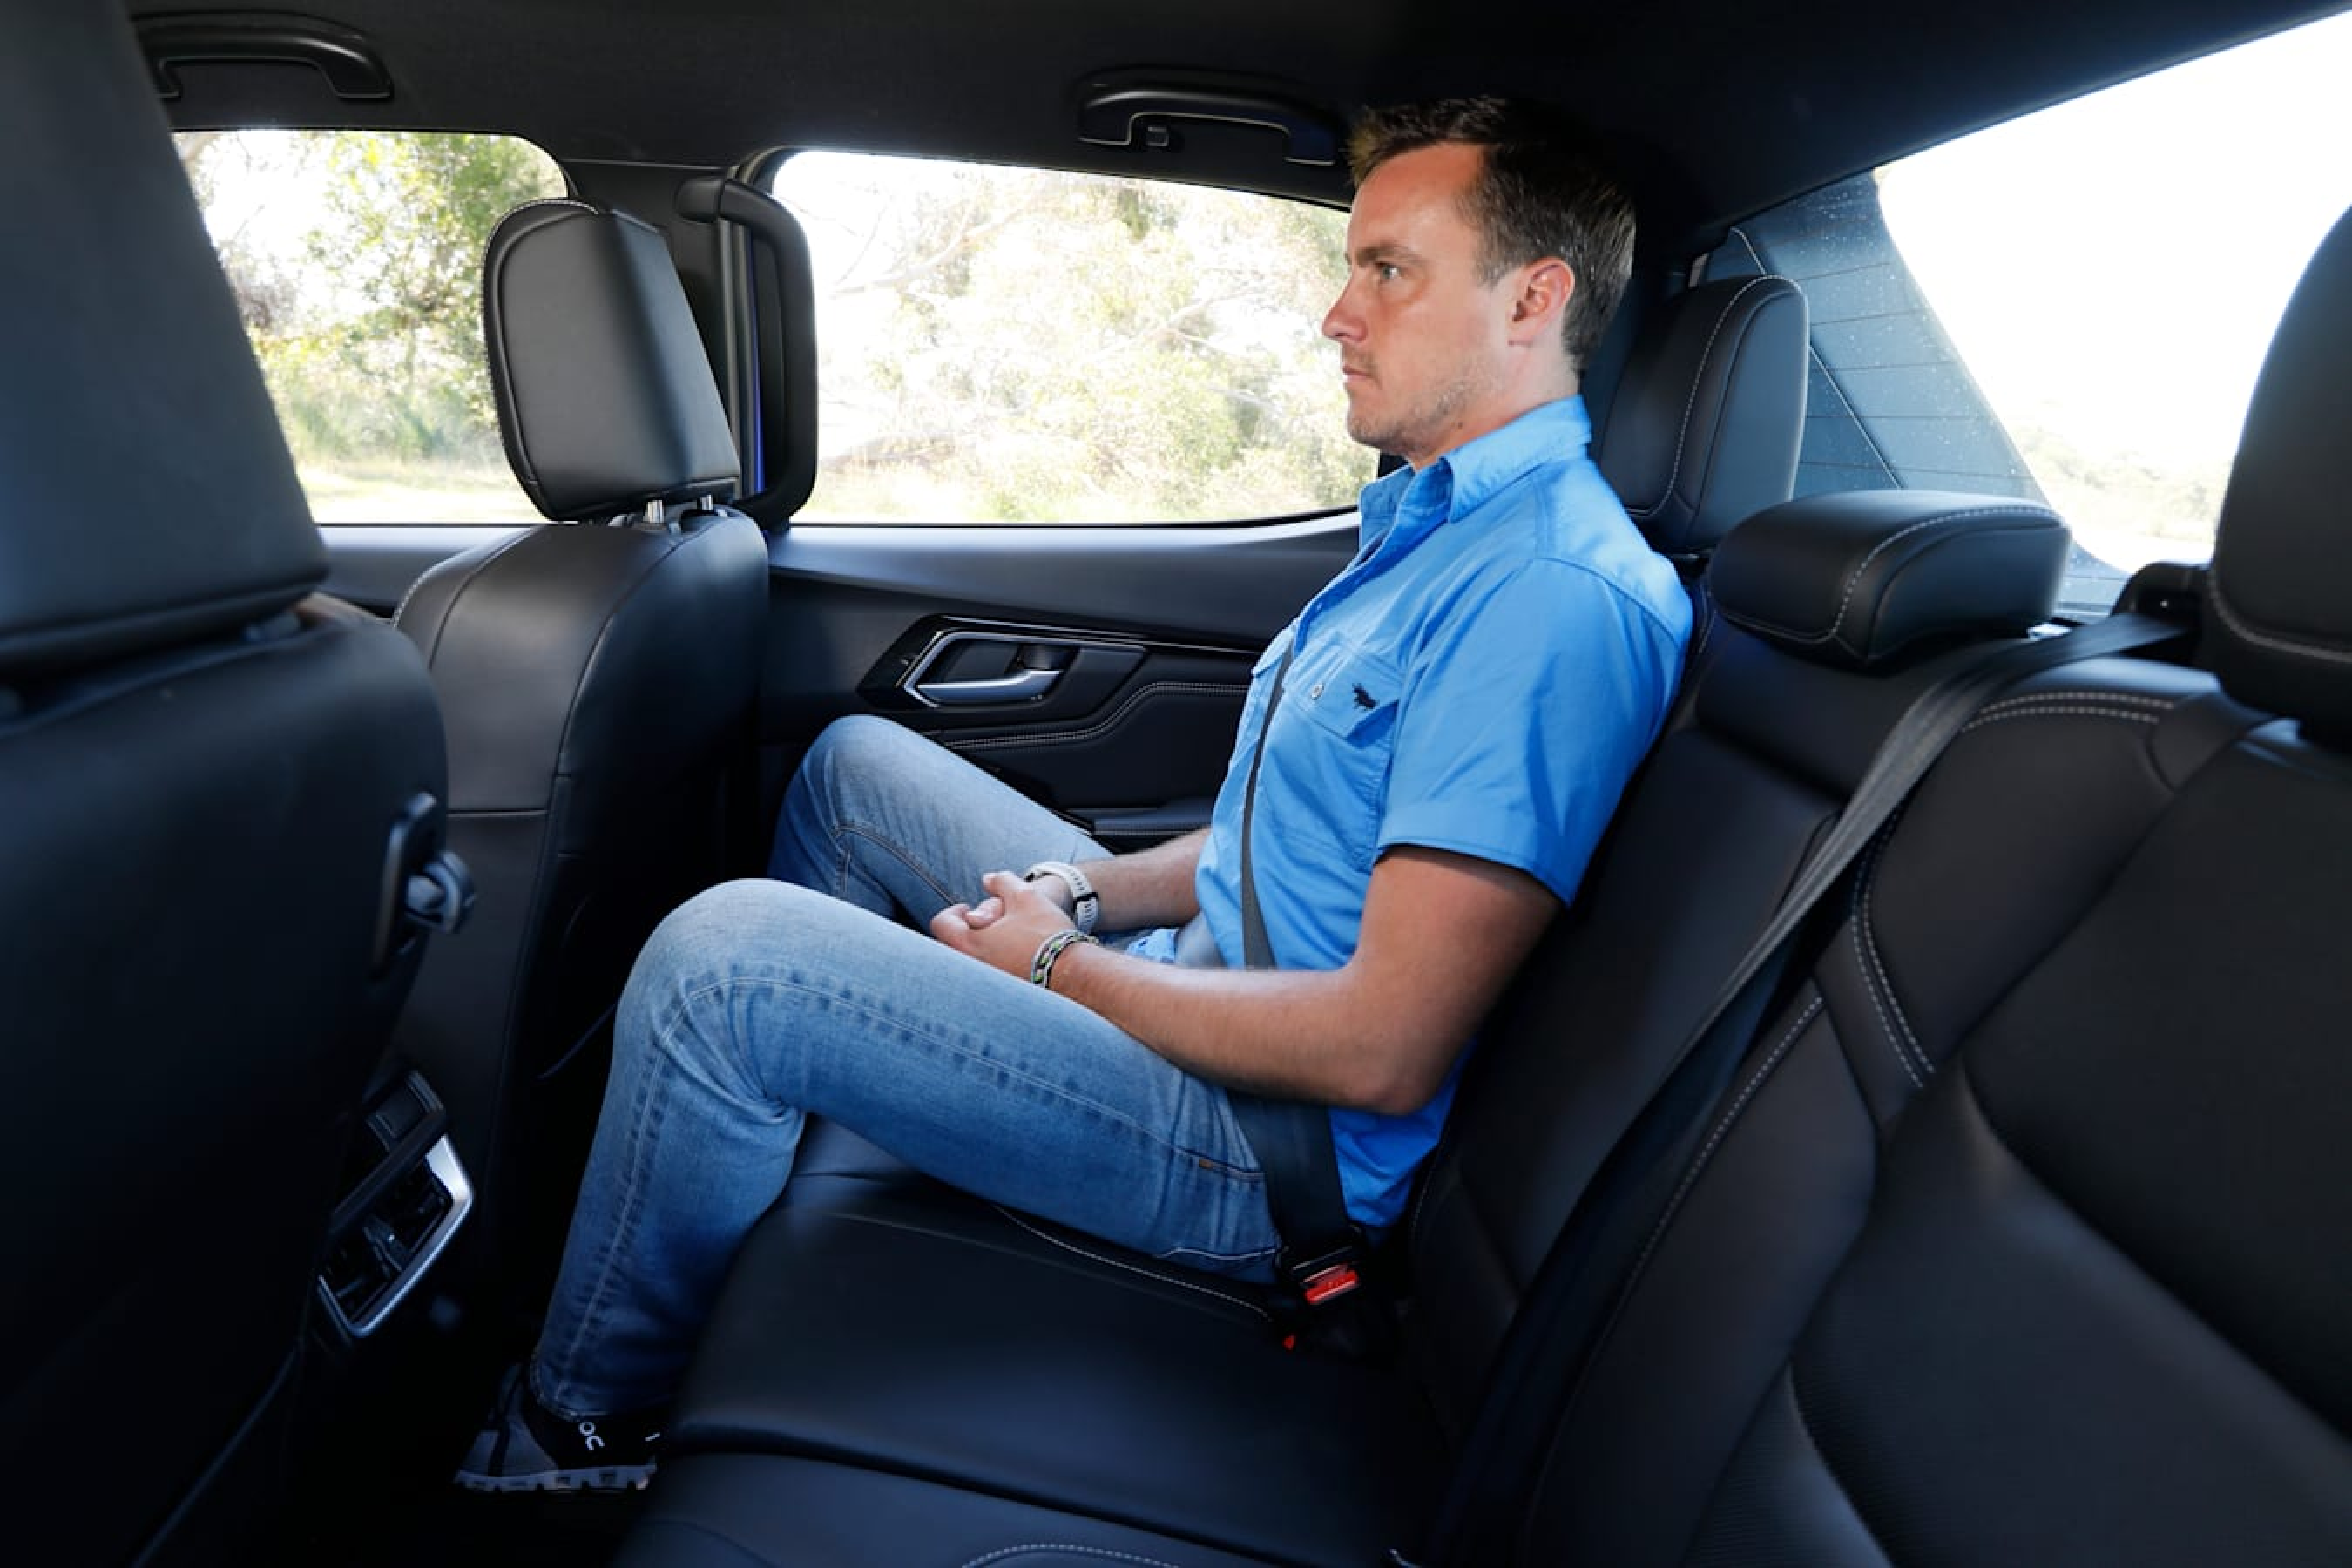 4 X 4 Australia Comparisons 2021 May 21 Isuzu D Max X Terrain Rear Seat Space